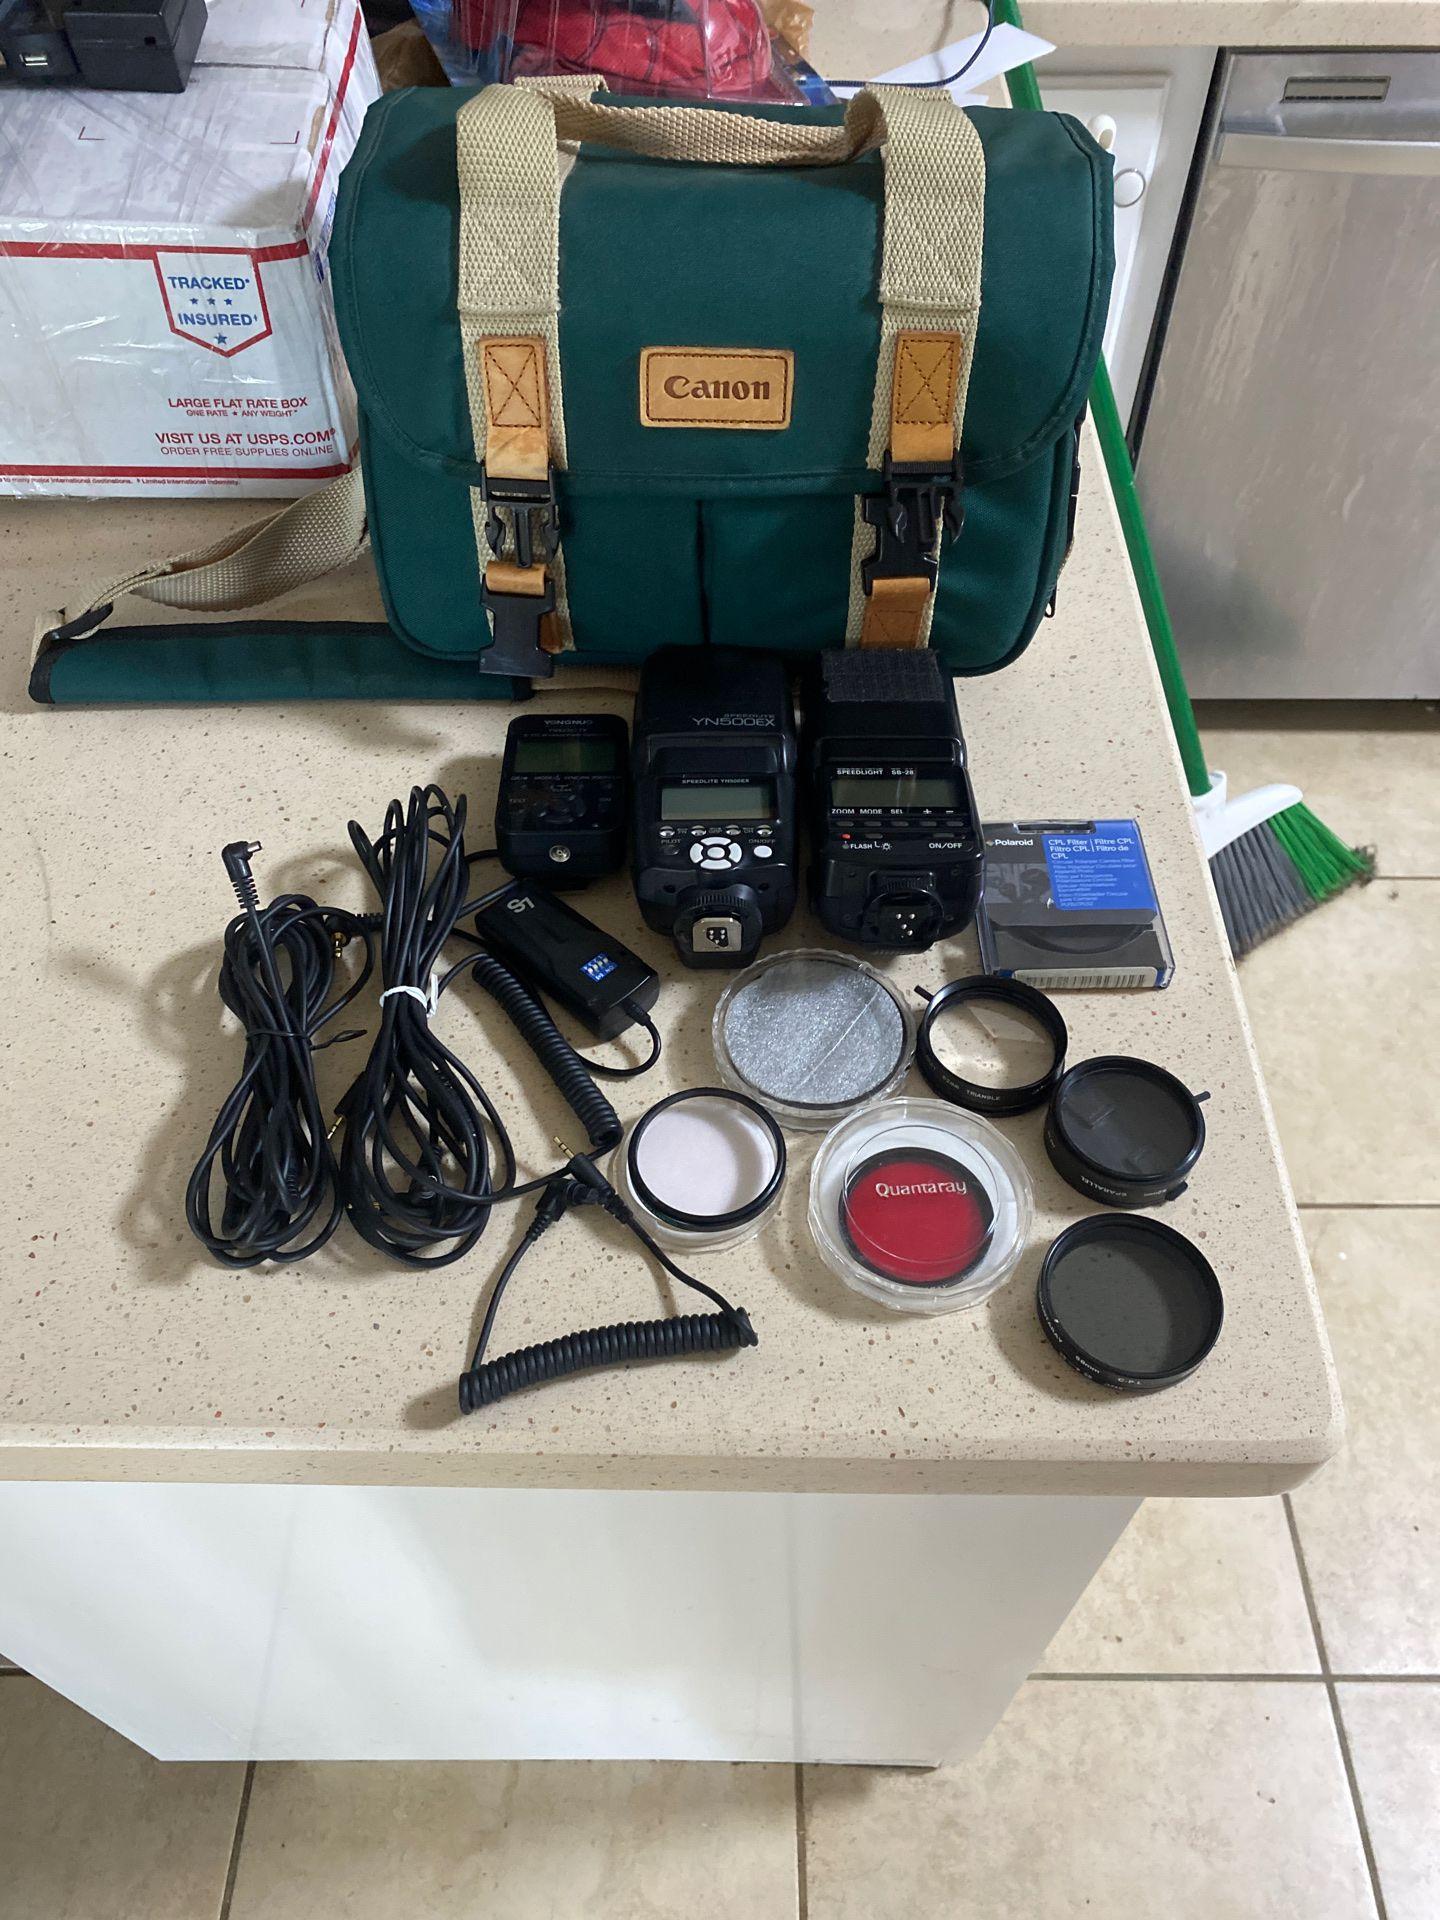 Nikon Speedlight + Yougnuo Speedlite & Wireless Flash Contoller + Lenses & Bag